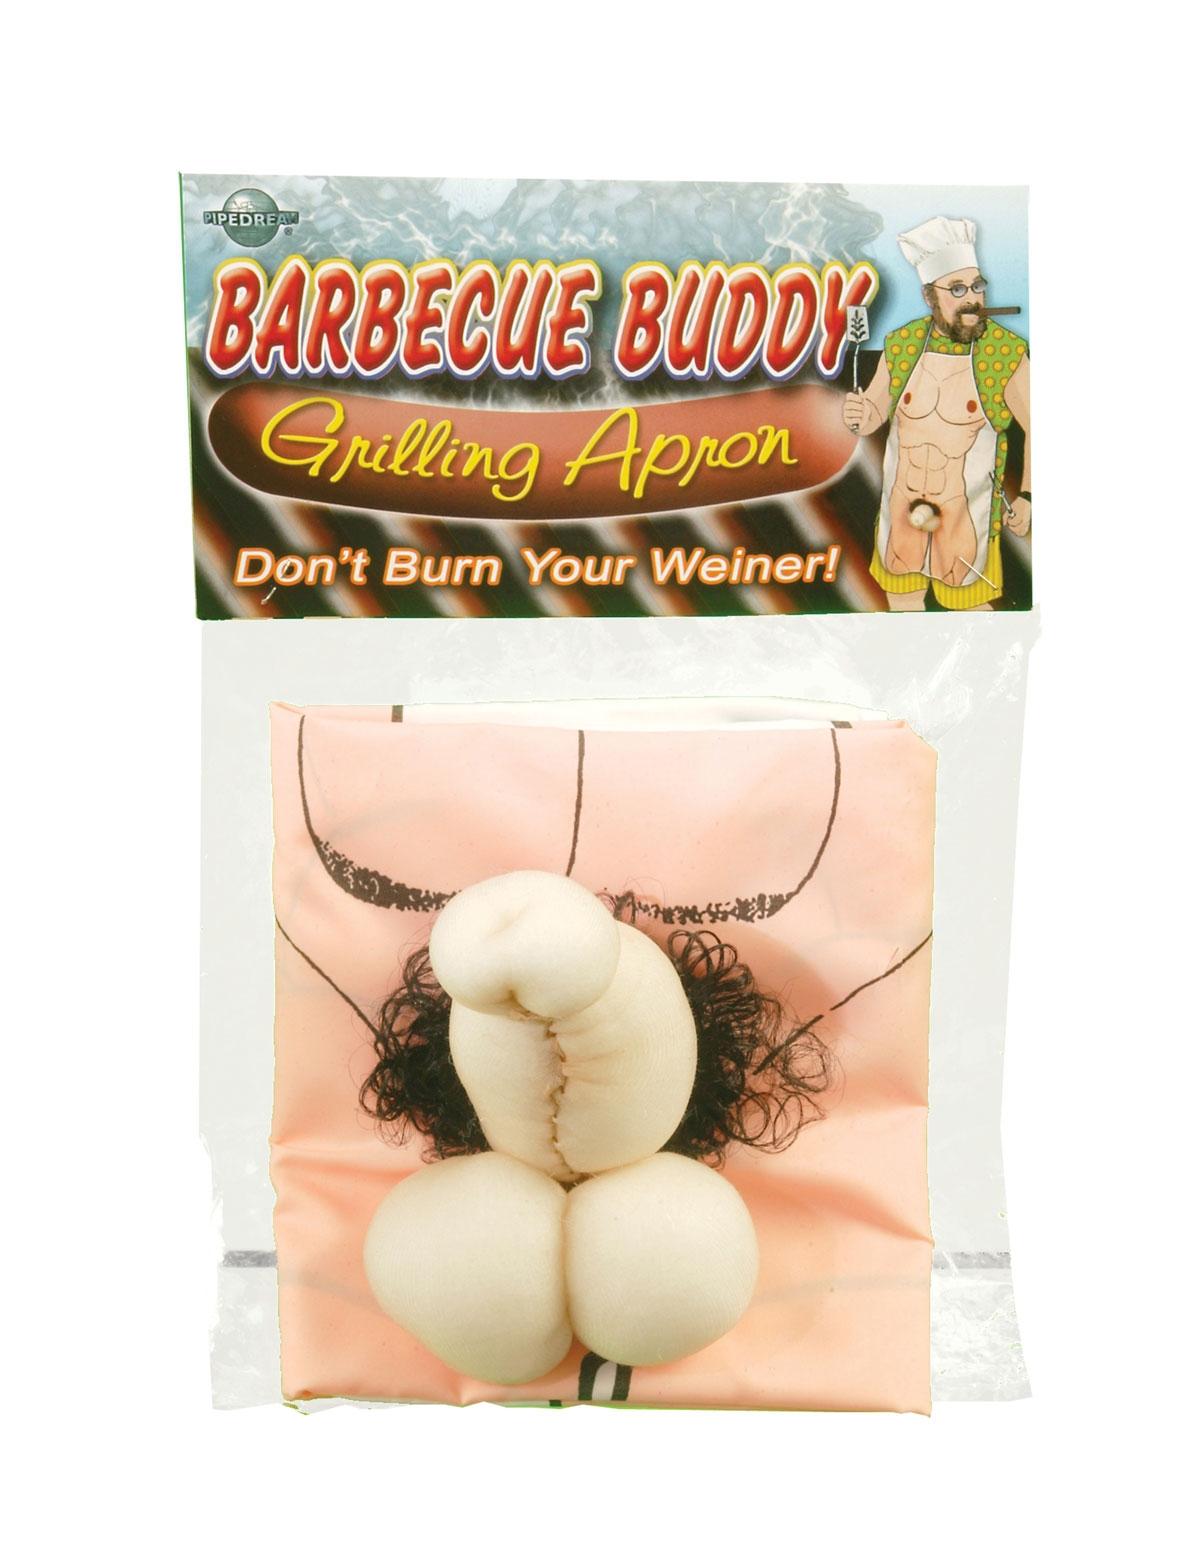 Bbq Buddy Apron